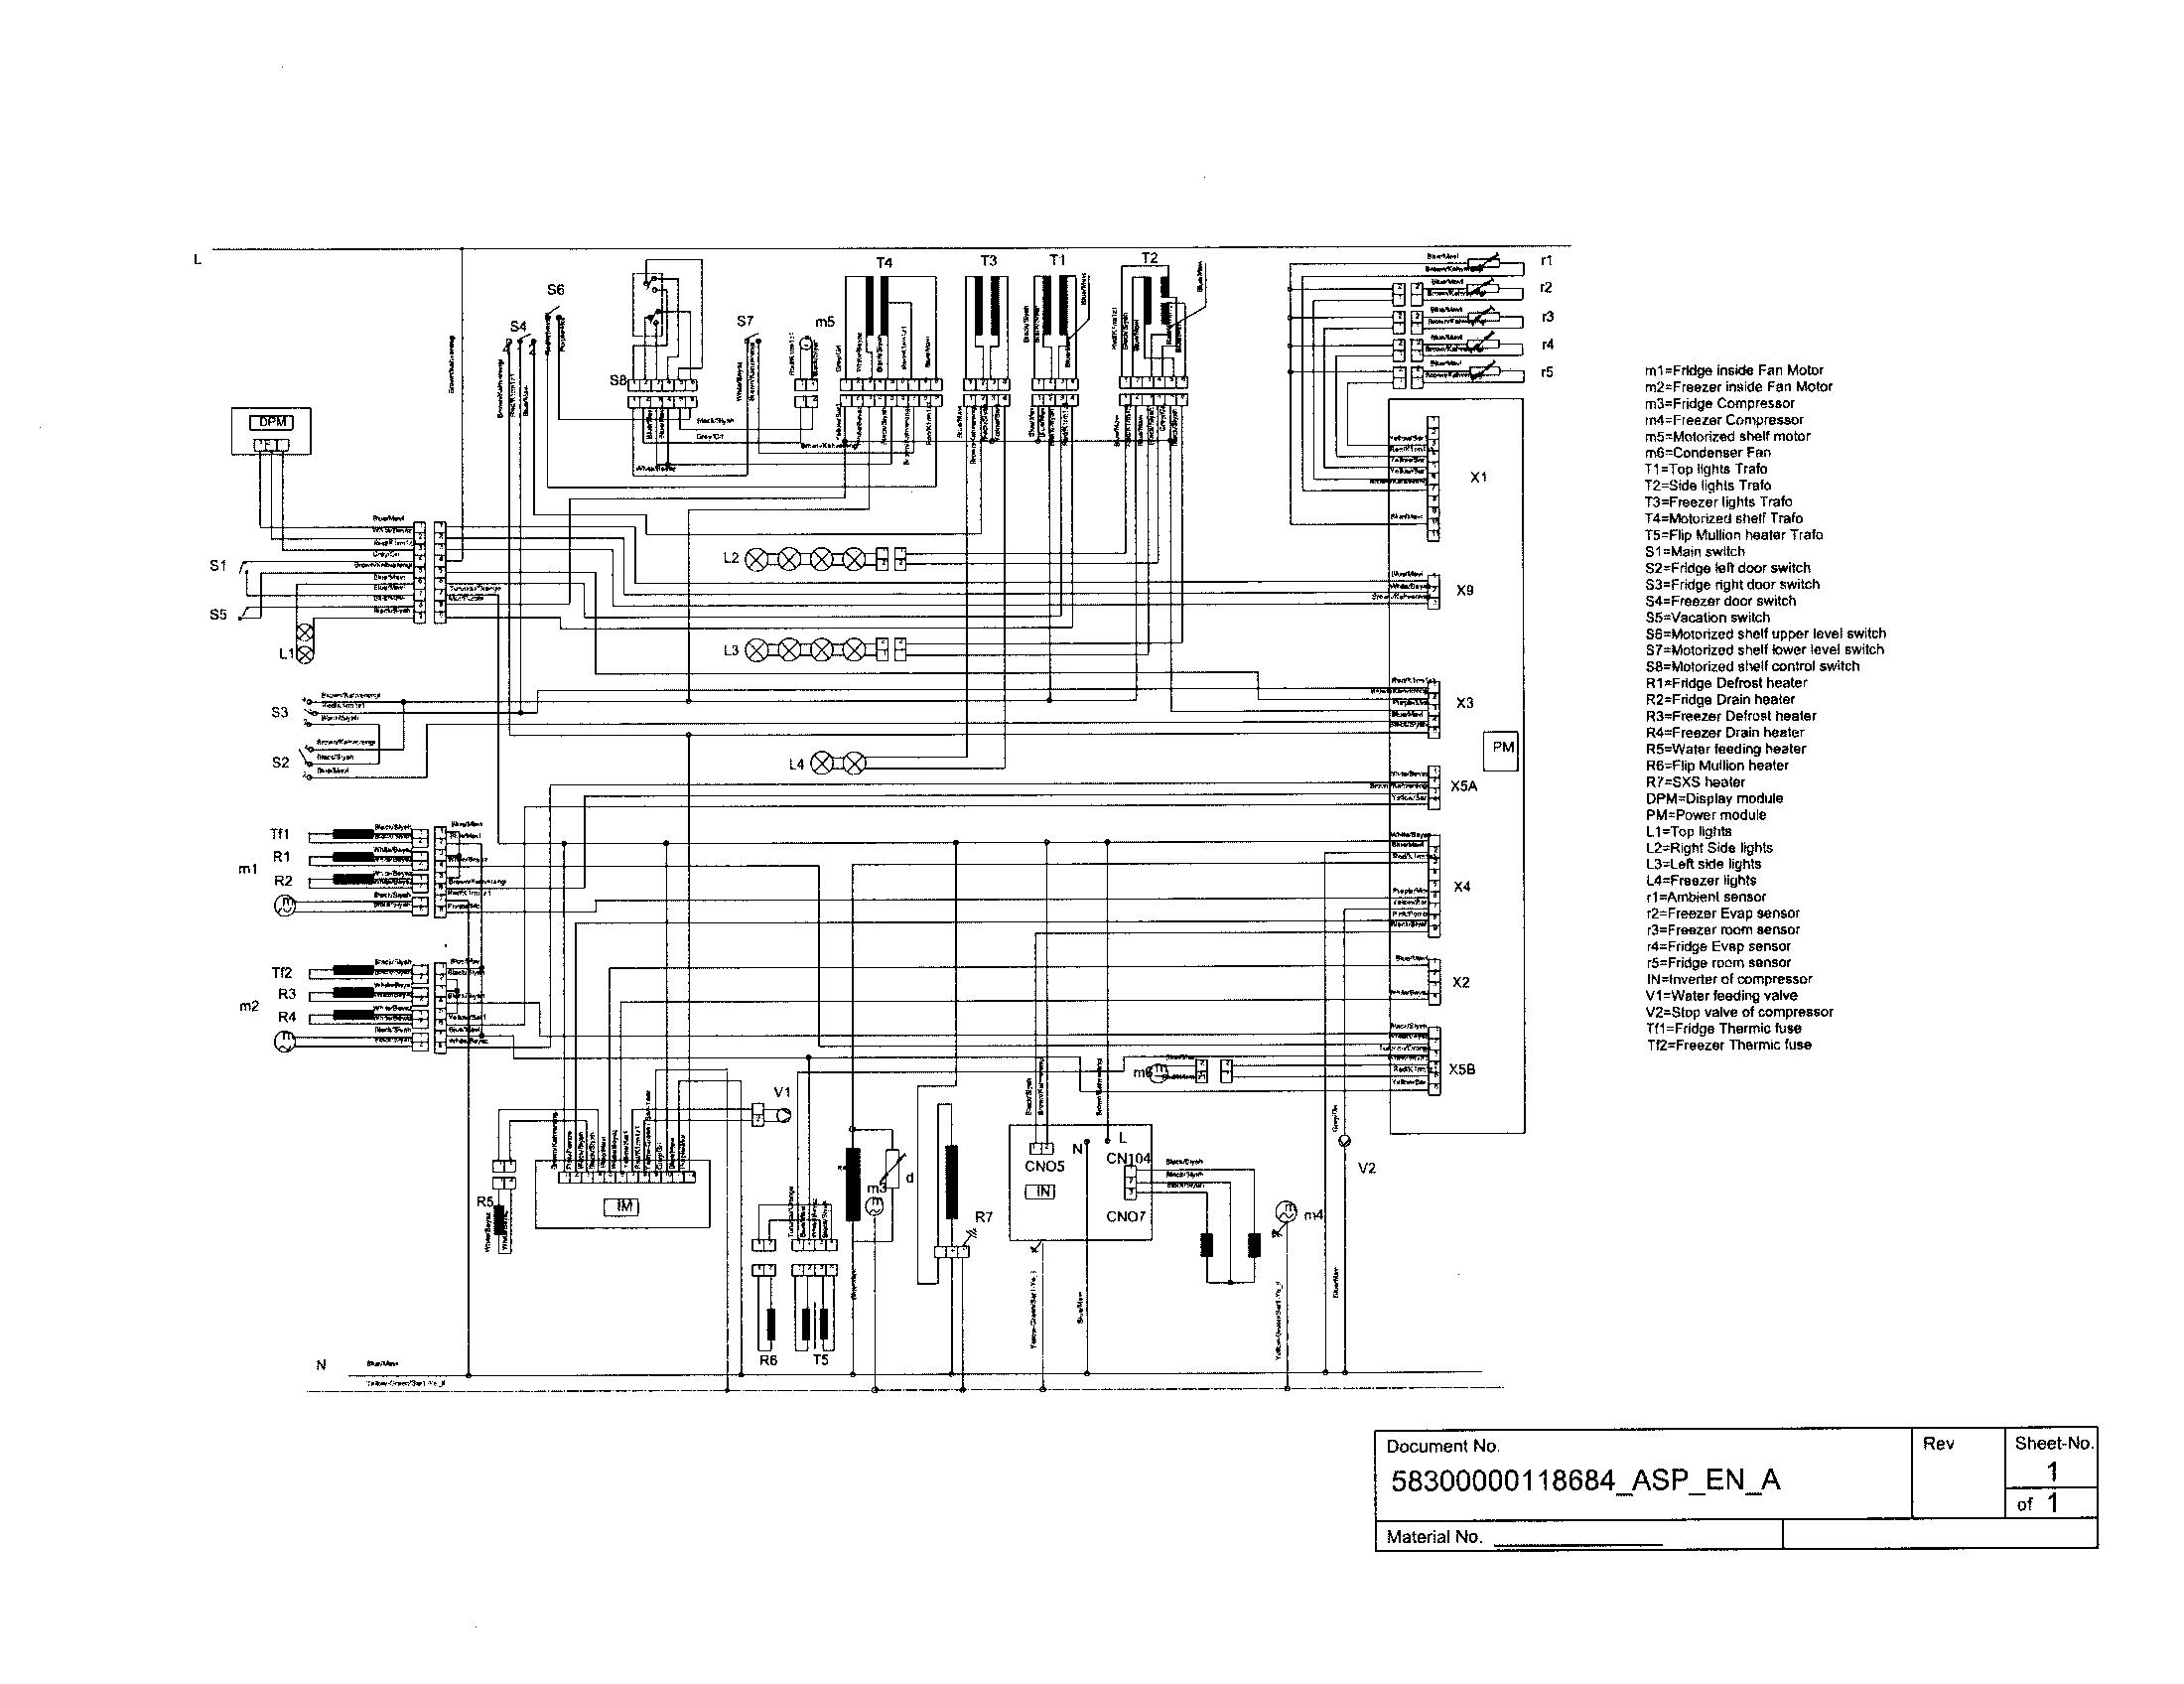 medium resolution of traulsen wiring schematics wiring diagrams bibwiring traulsen diagram rhf132wp hhs wiring diagram centre traulsen wiring schematics